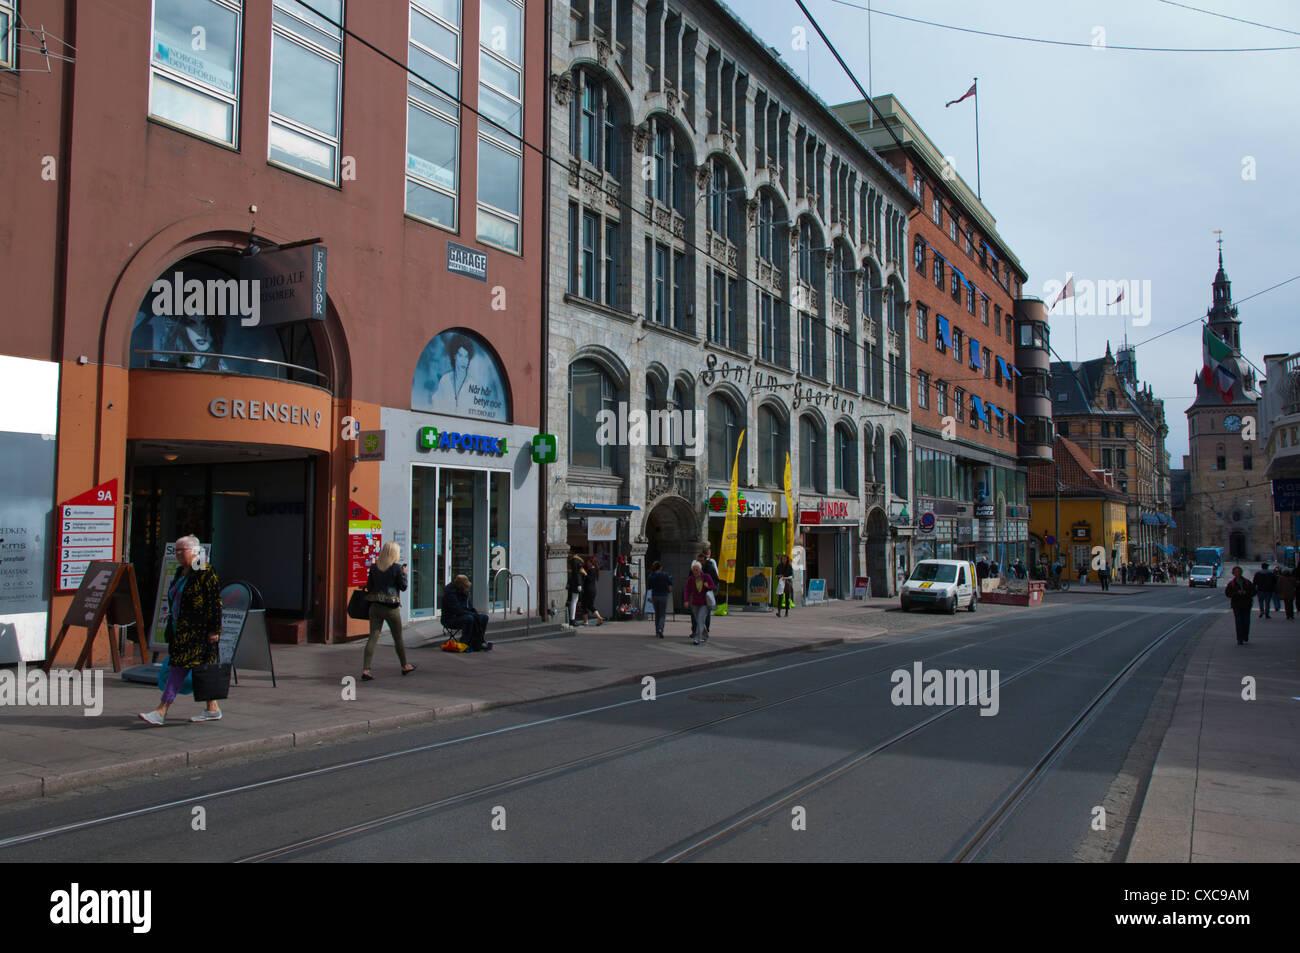 Grensen street Sentrum central Oslo Norway Europe - Stock Image